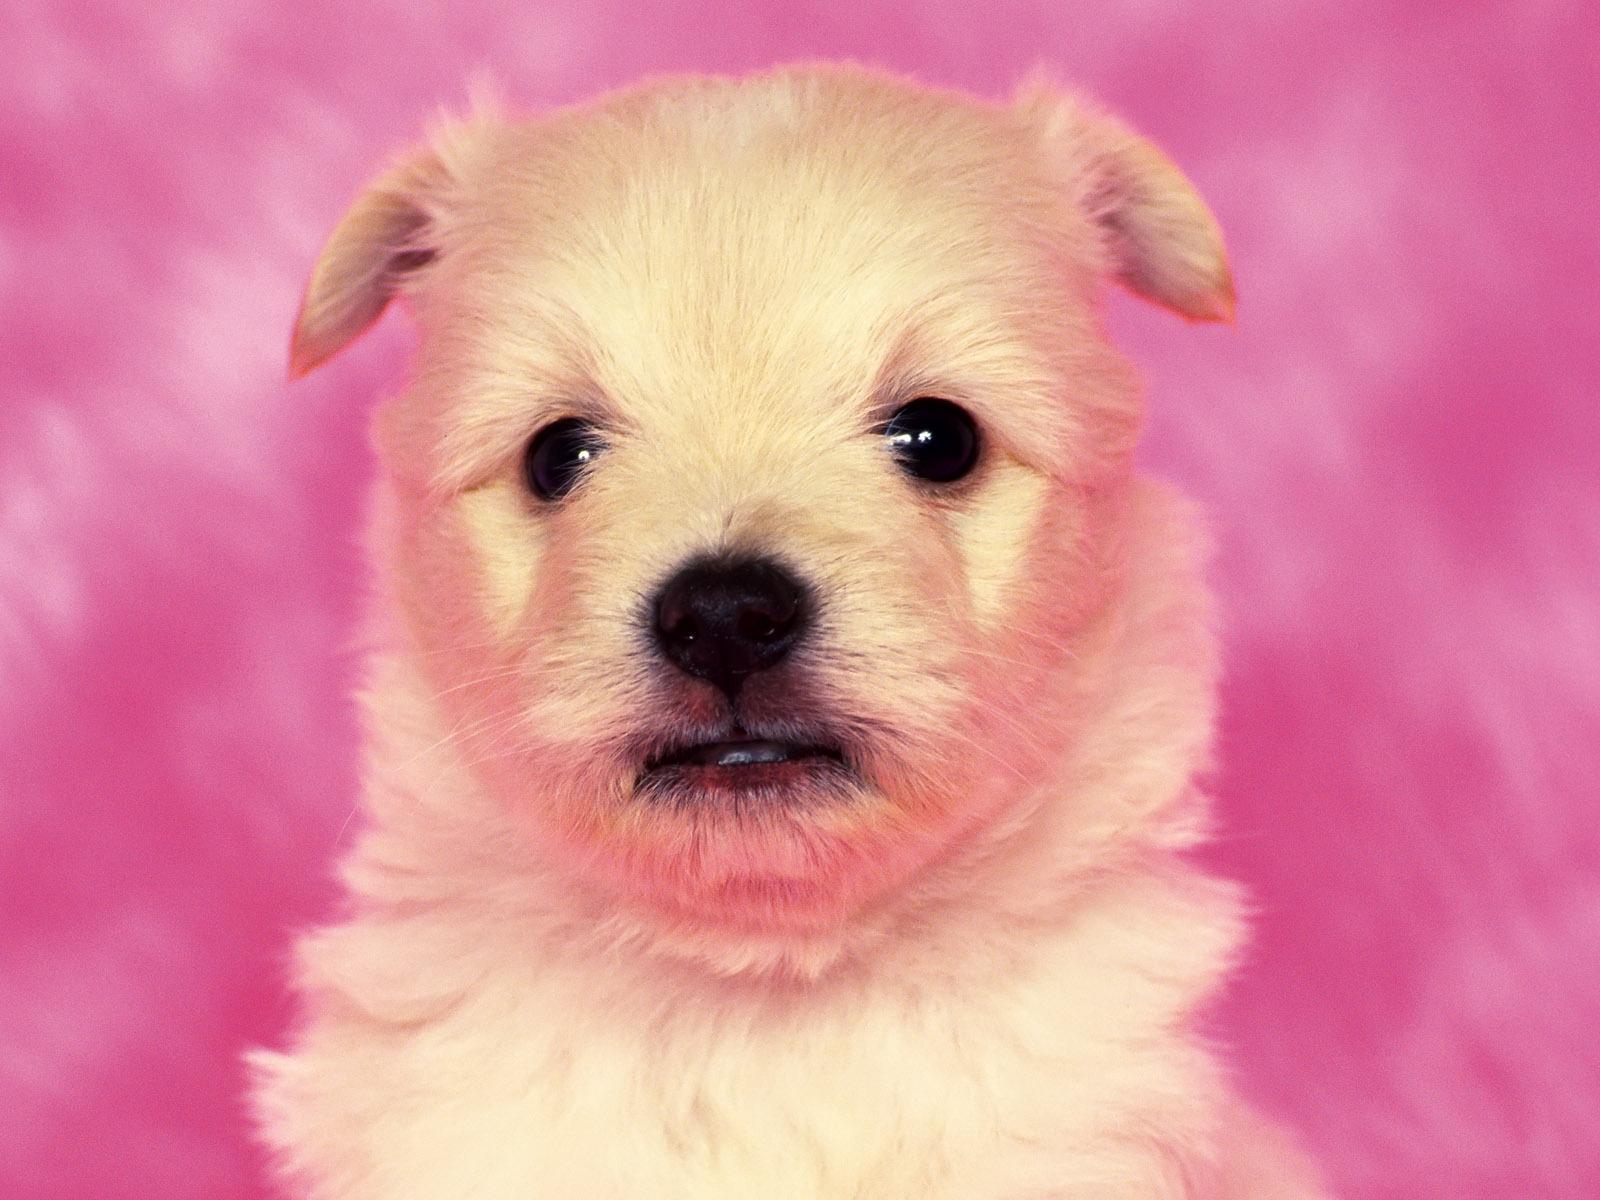 Dog Wallpaper   Dogs Wallpaper 14051342 1600x1200